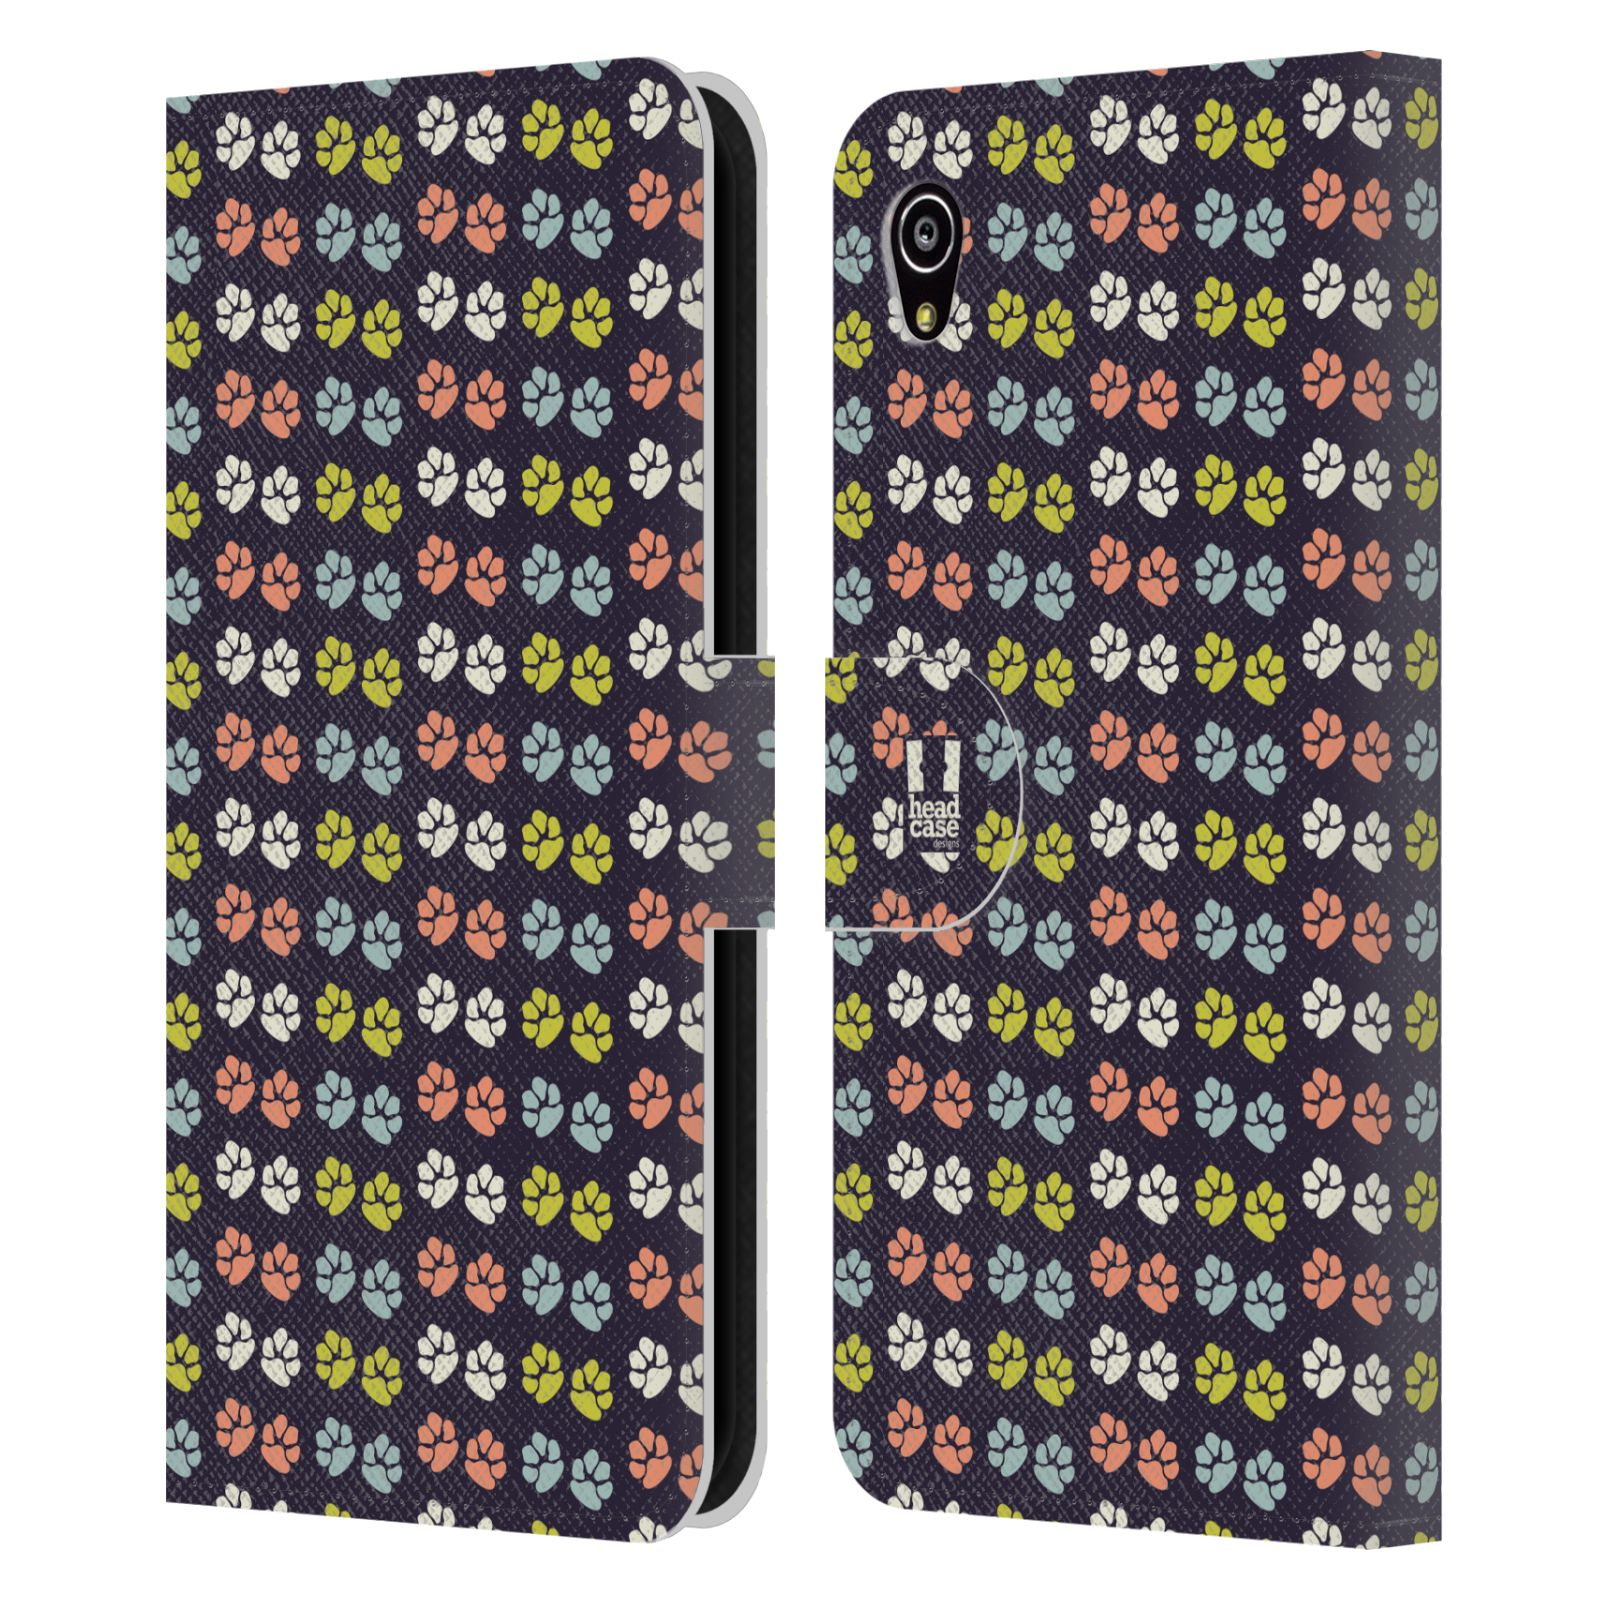 HEAD CASE Flipové pouzdro pro mobil SONY XPERIA M4 AQUA Pejsek ťapky barevné RETRO